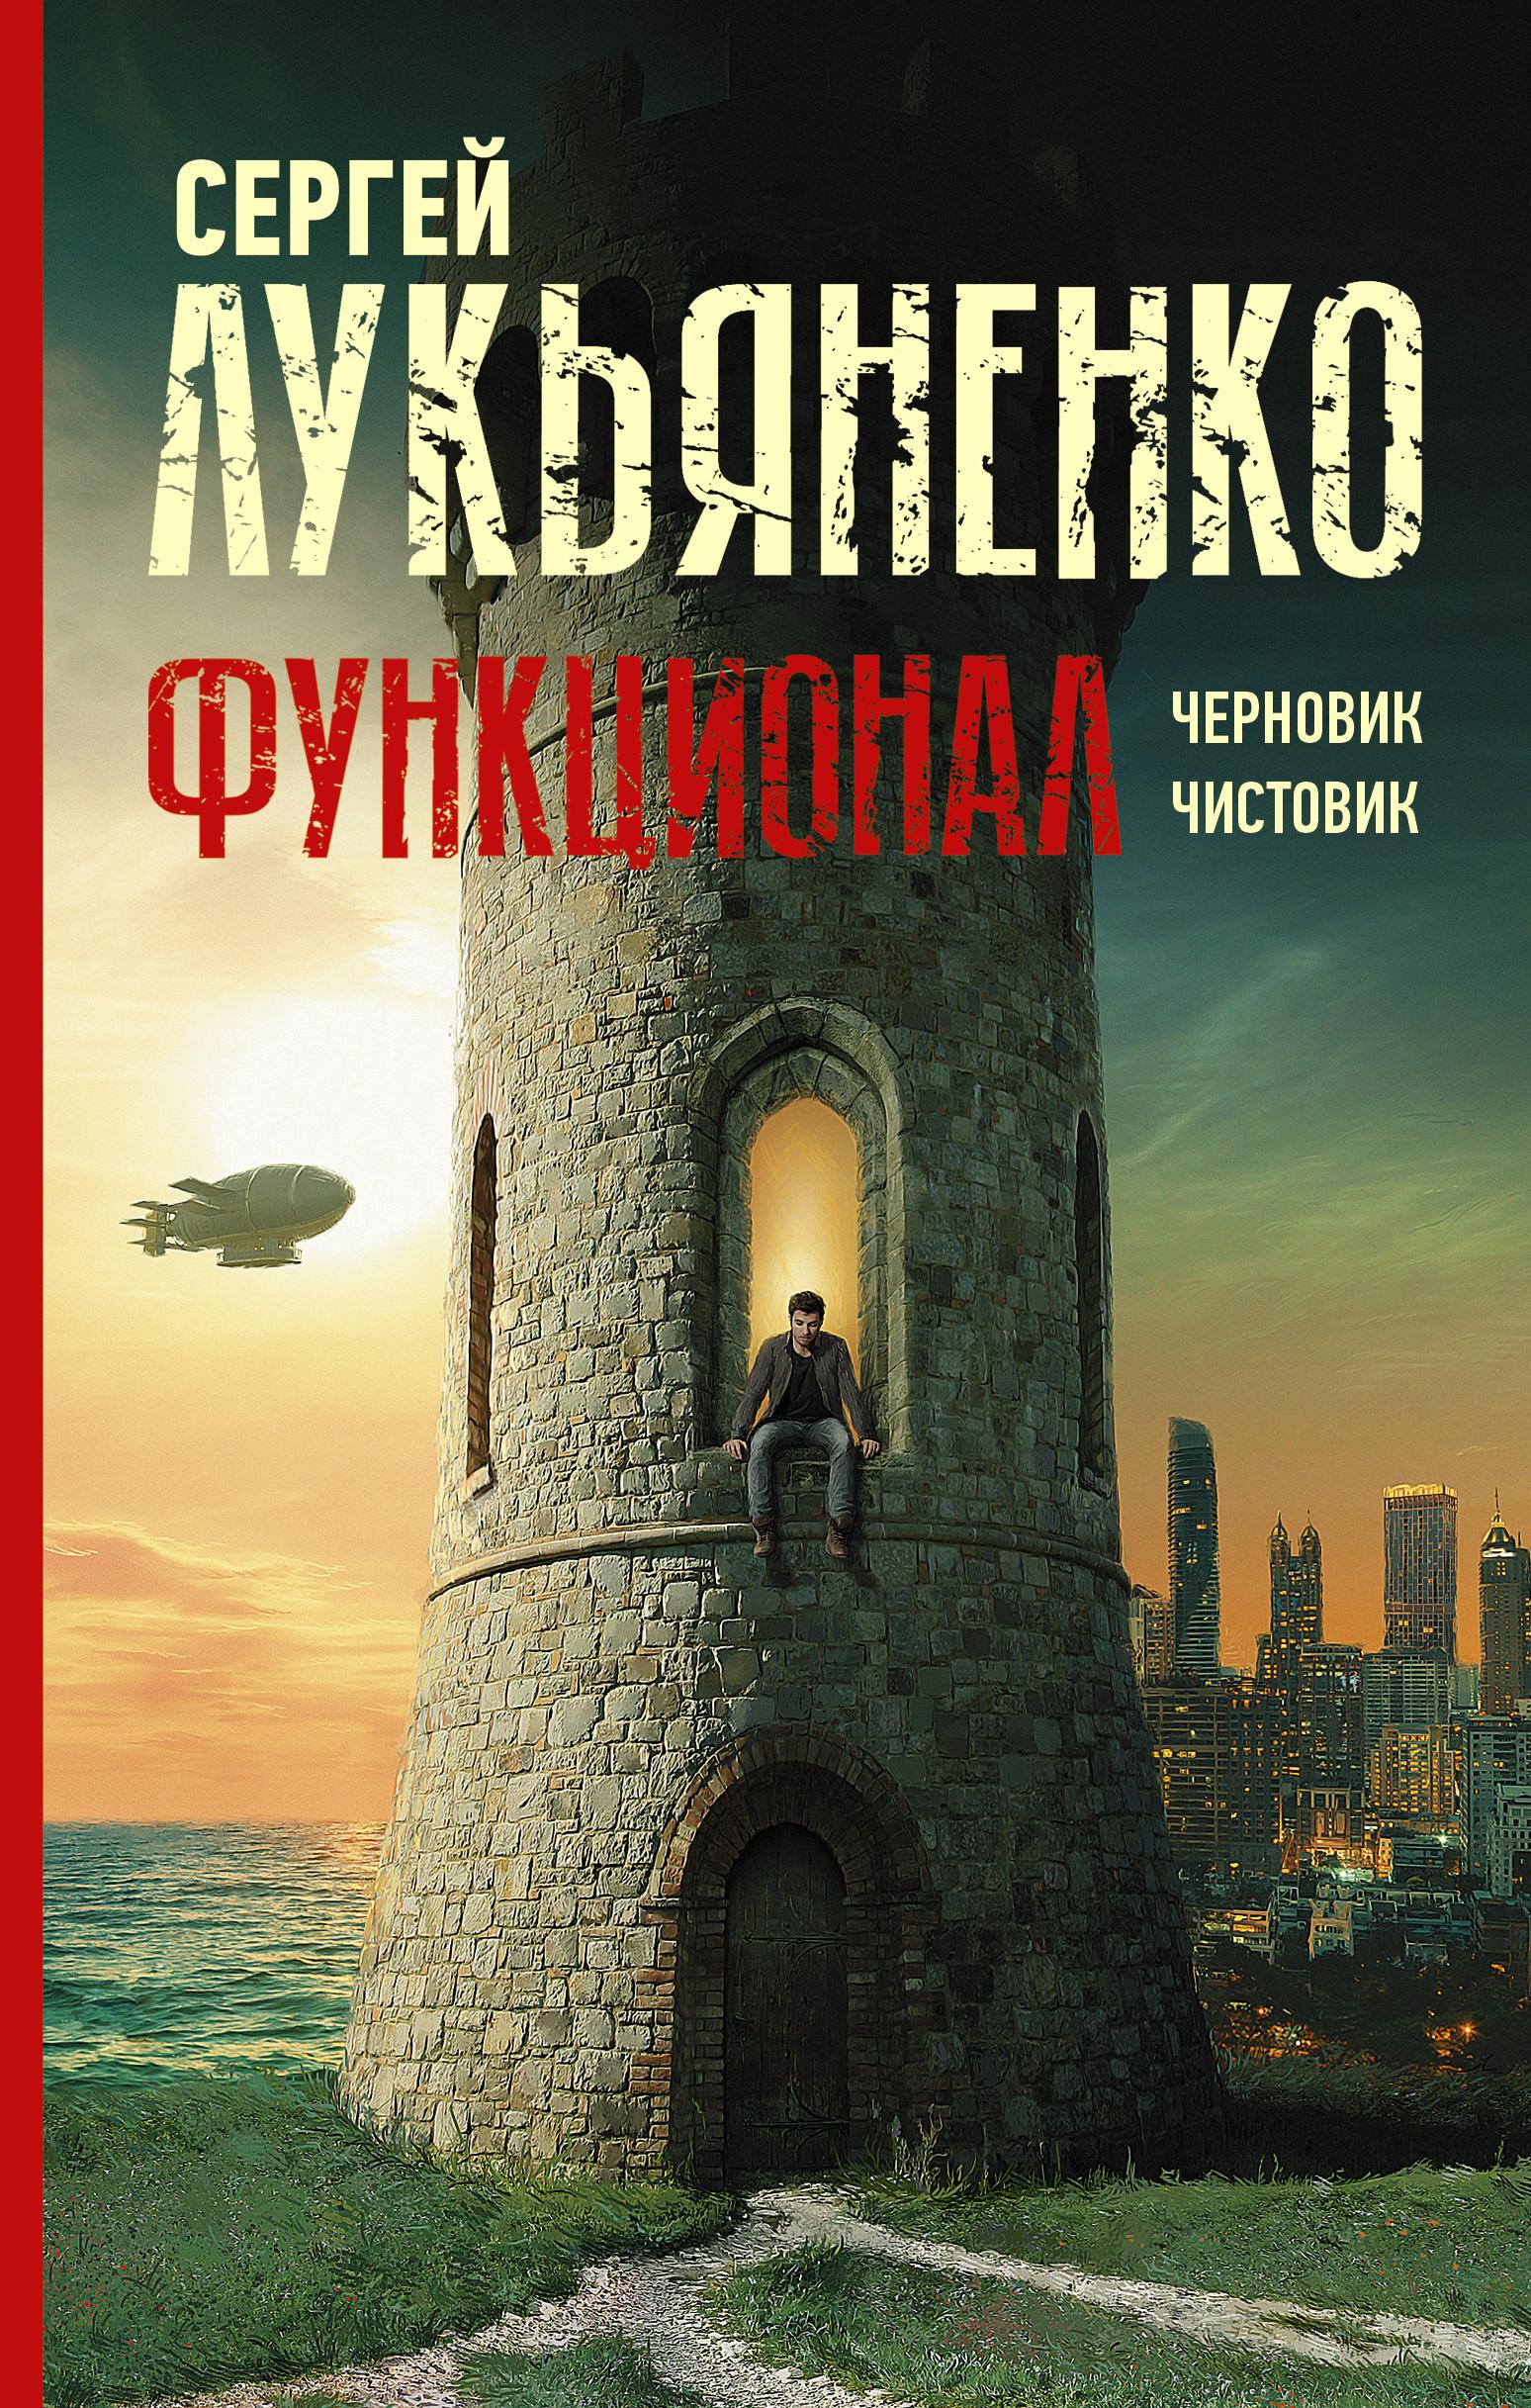 Сергей Лукьяненко «Черновик. Чистовик»